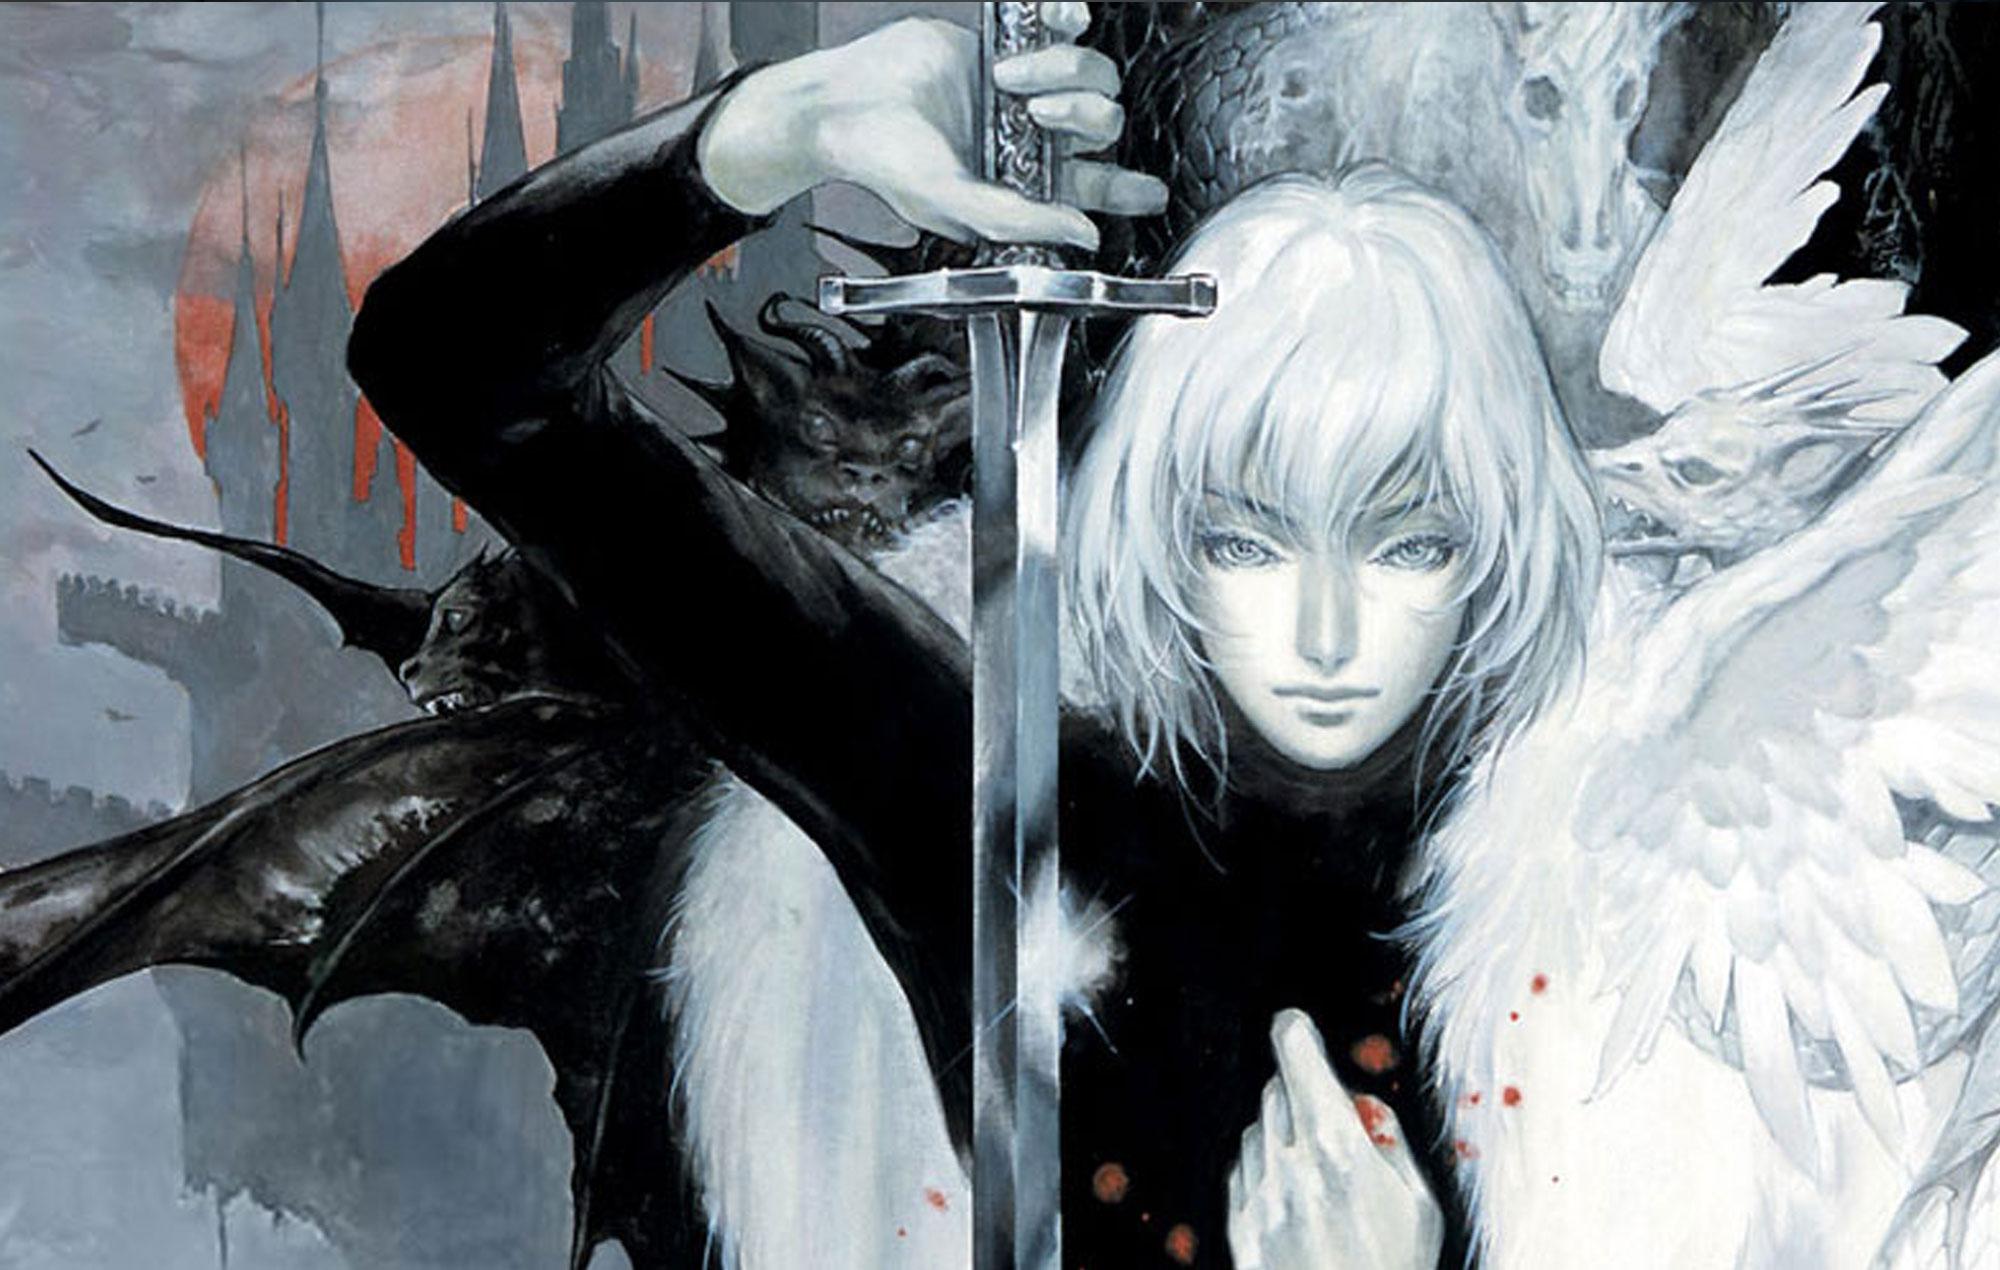 Castlevania: Aria Of Sorrow concept art